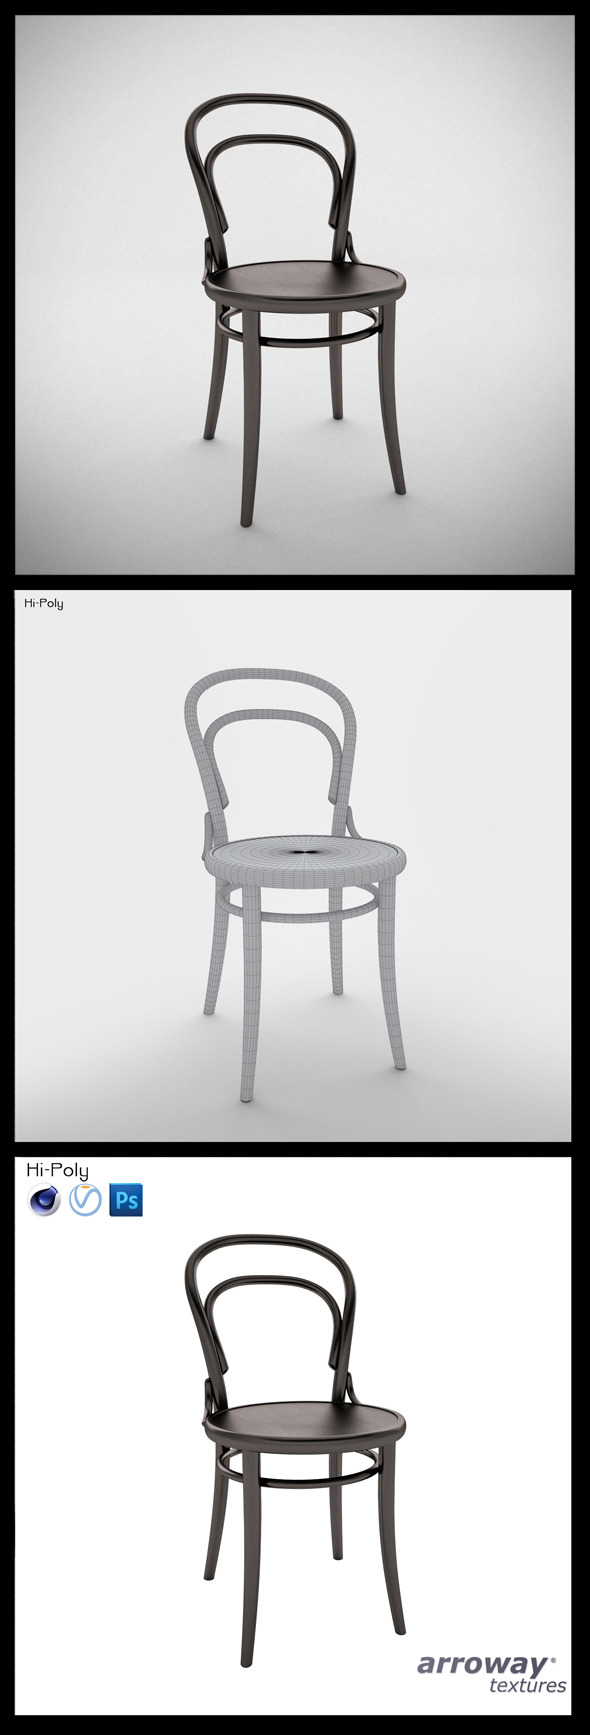 Ton N°14 Hi-Poly - 3DOcean Item for Sale